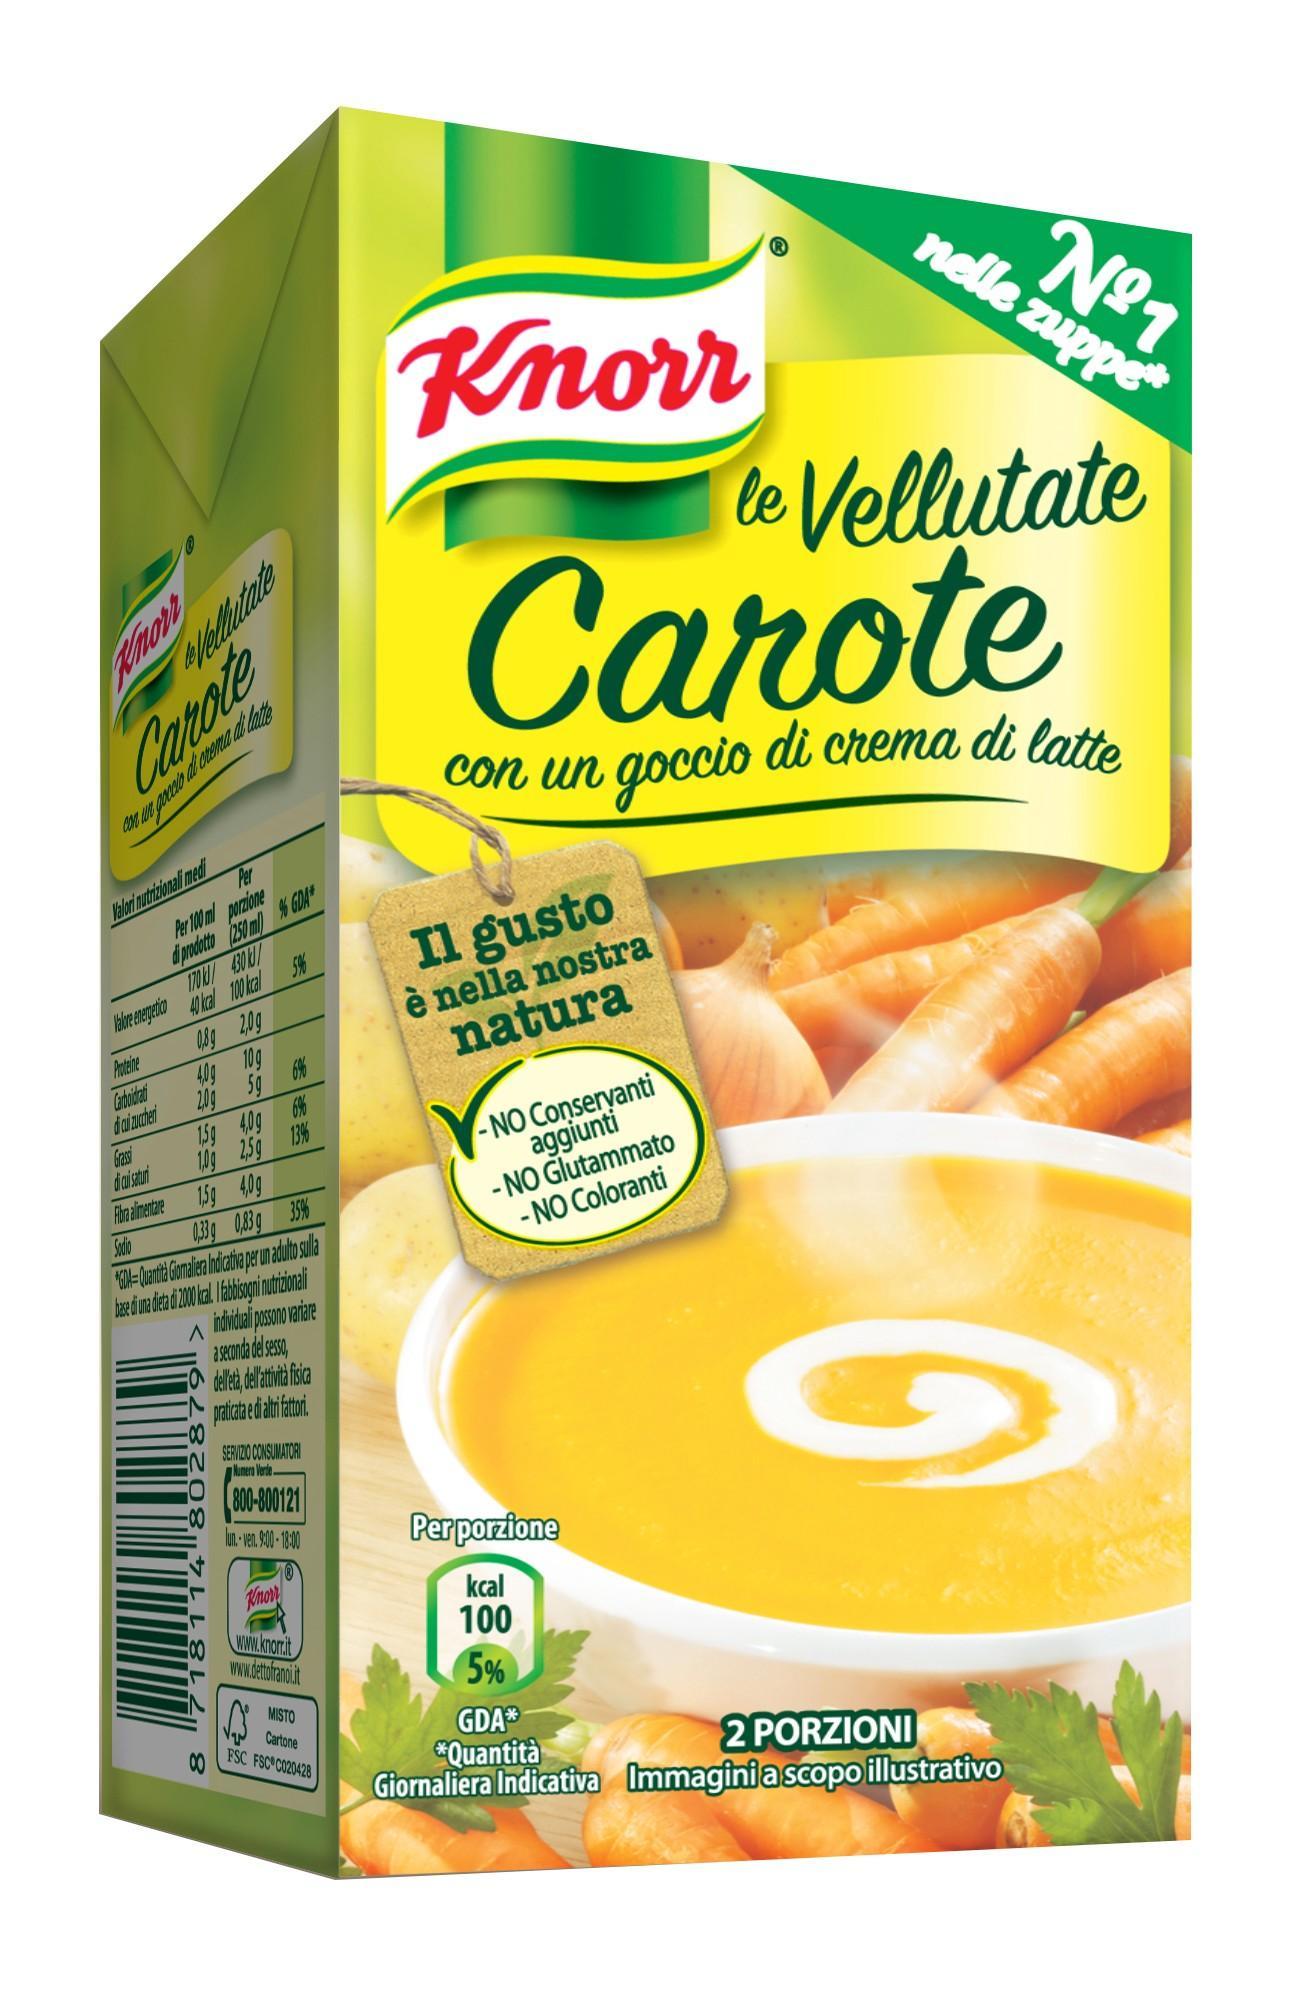 Vellutata Carote Knorr